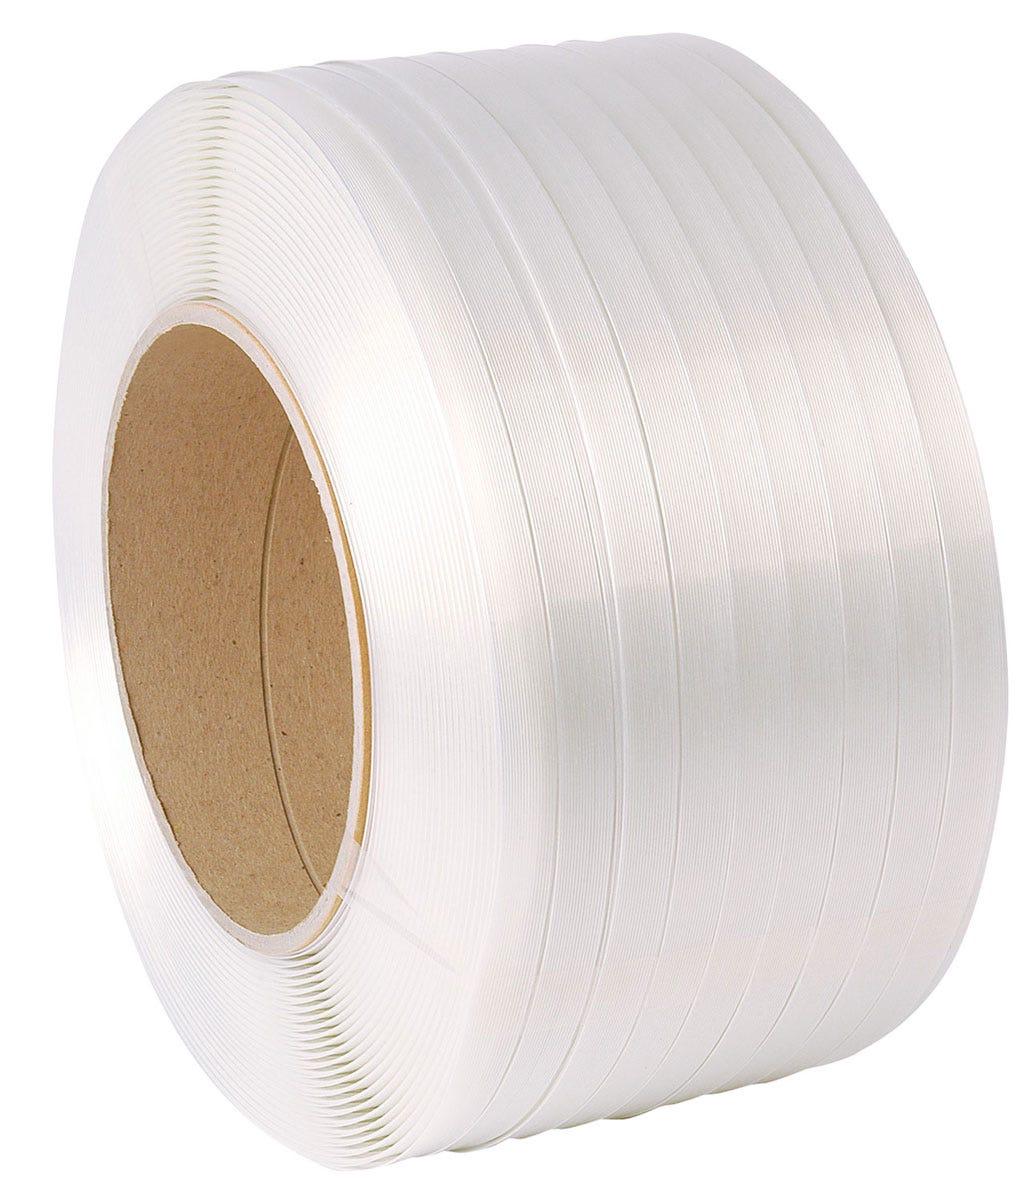 Safeguard® 25mm Composite Strap